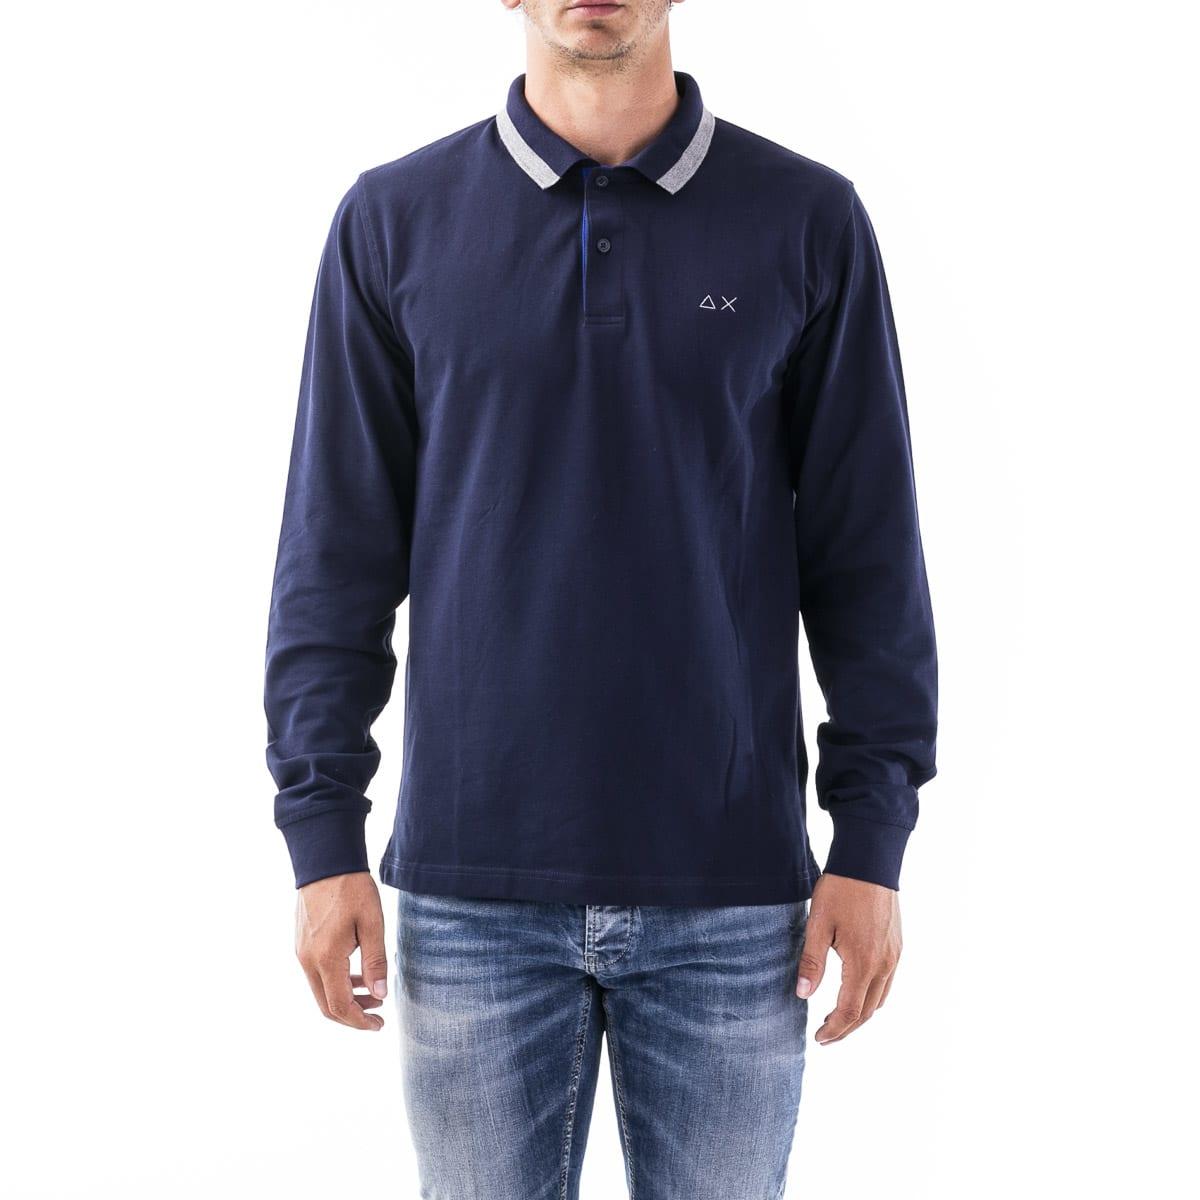 Sun68 Polo Shirt In Cotton Blend